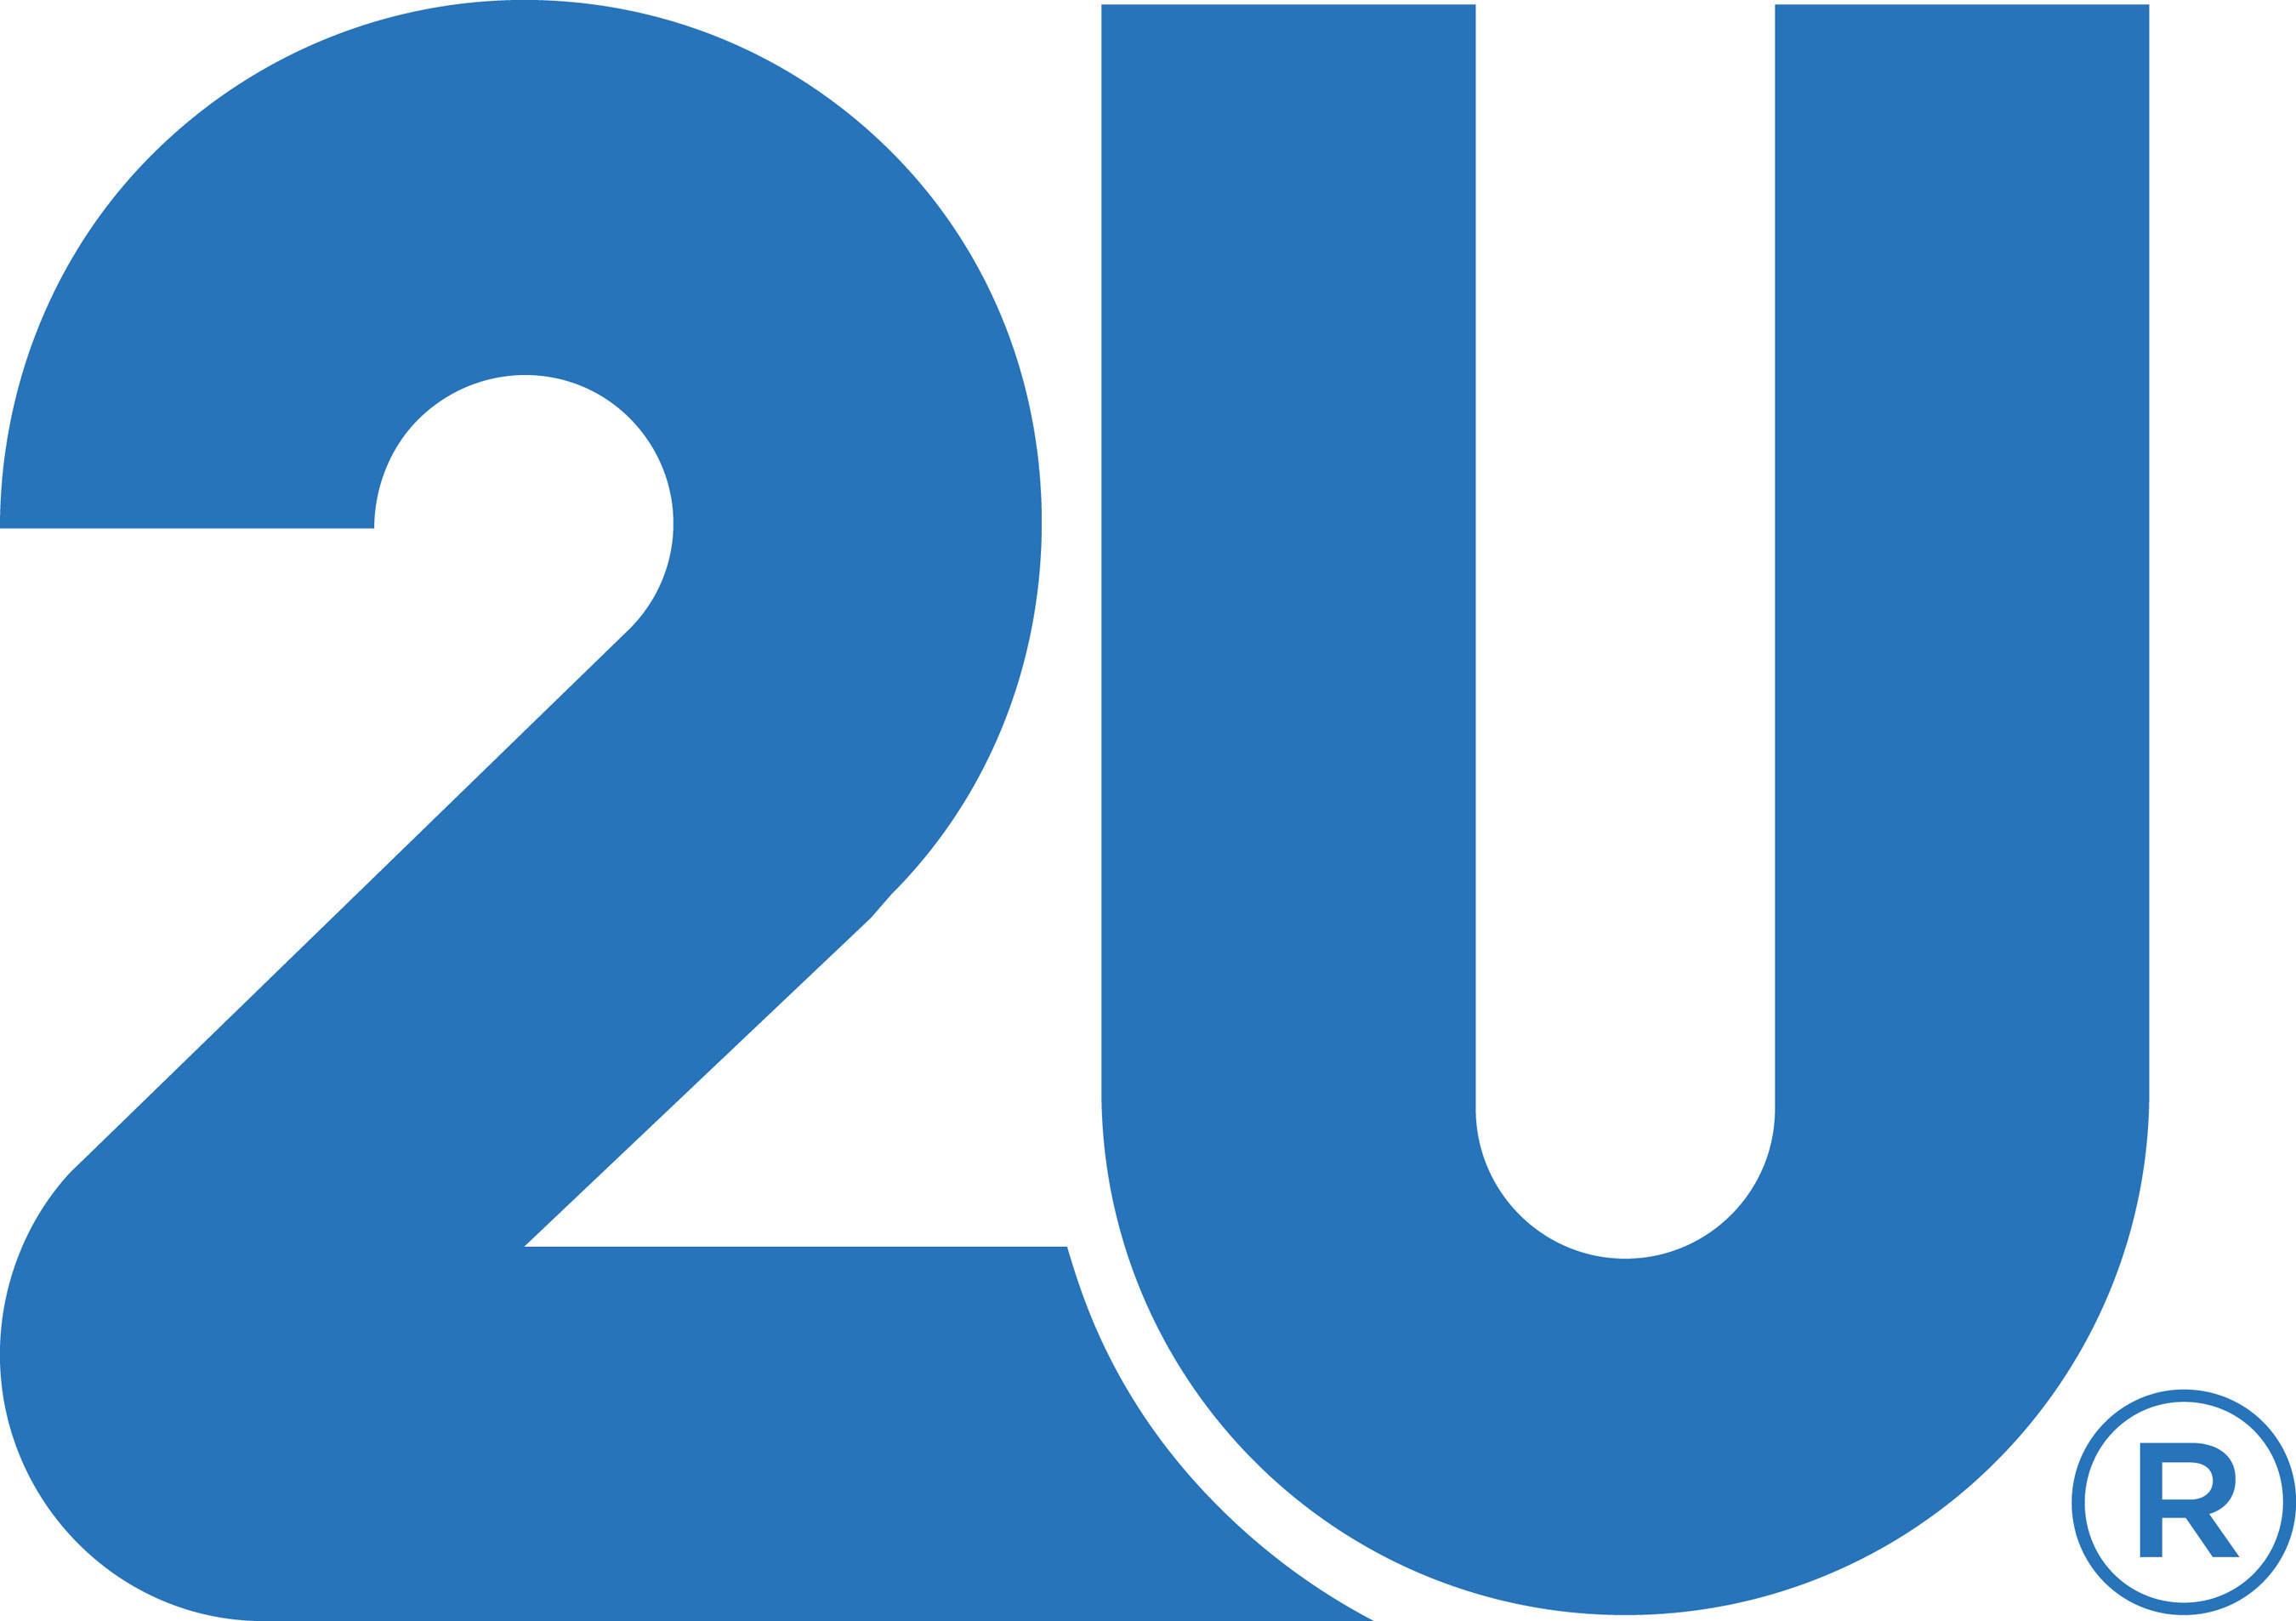 2U, Inc. Announces Pricing of Public Offering of Common Stock